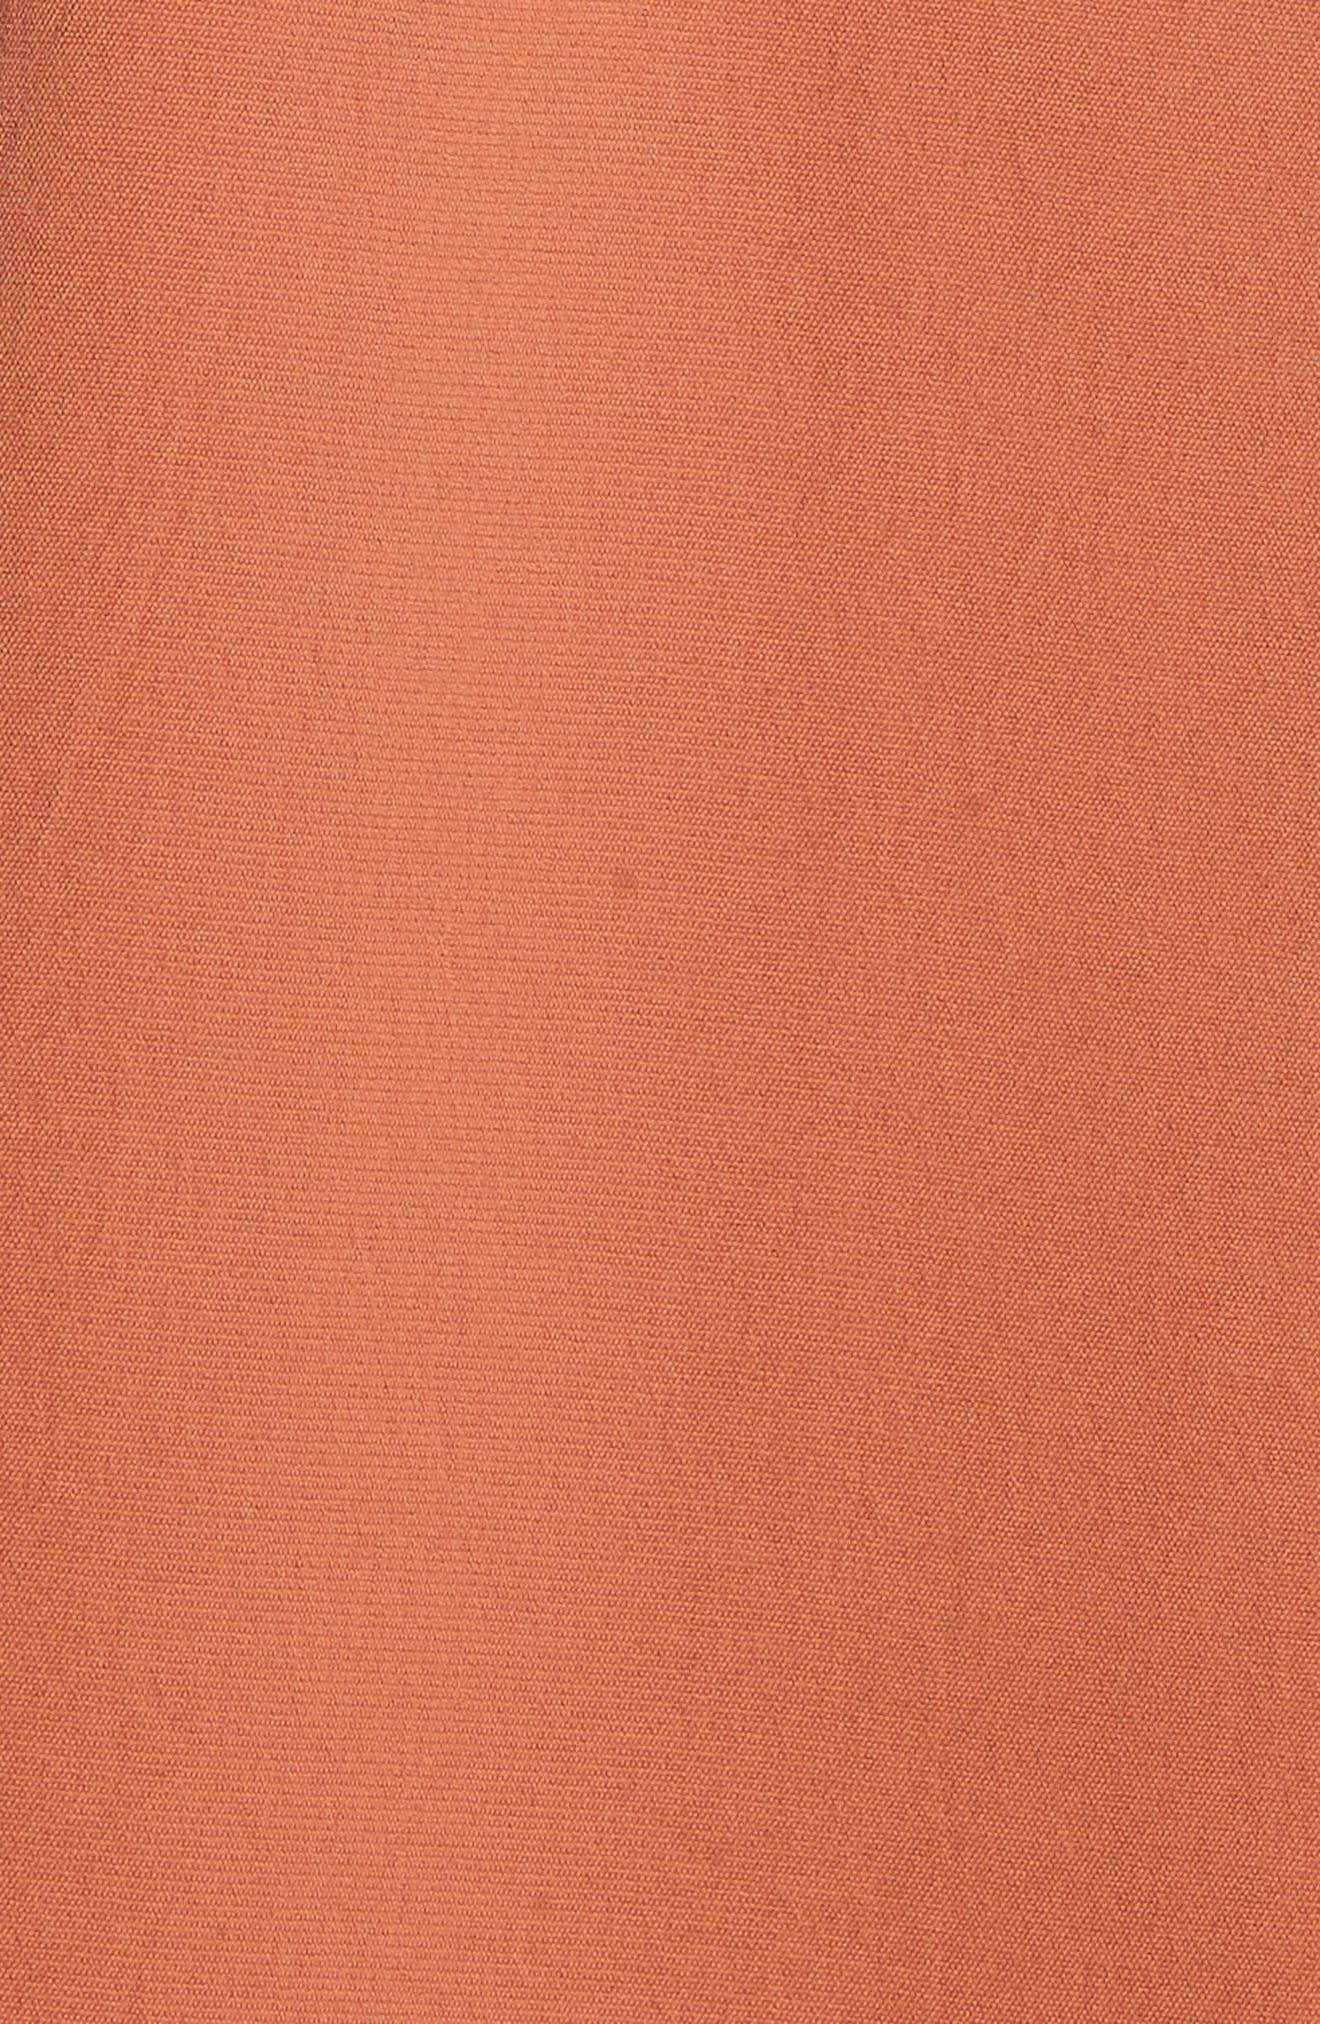 Draped Twill Trench Coat,                             Alternate thumbnail 6, color,                             200